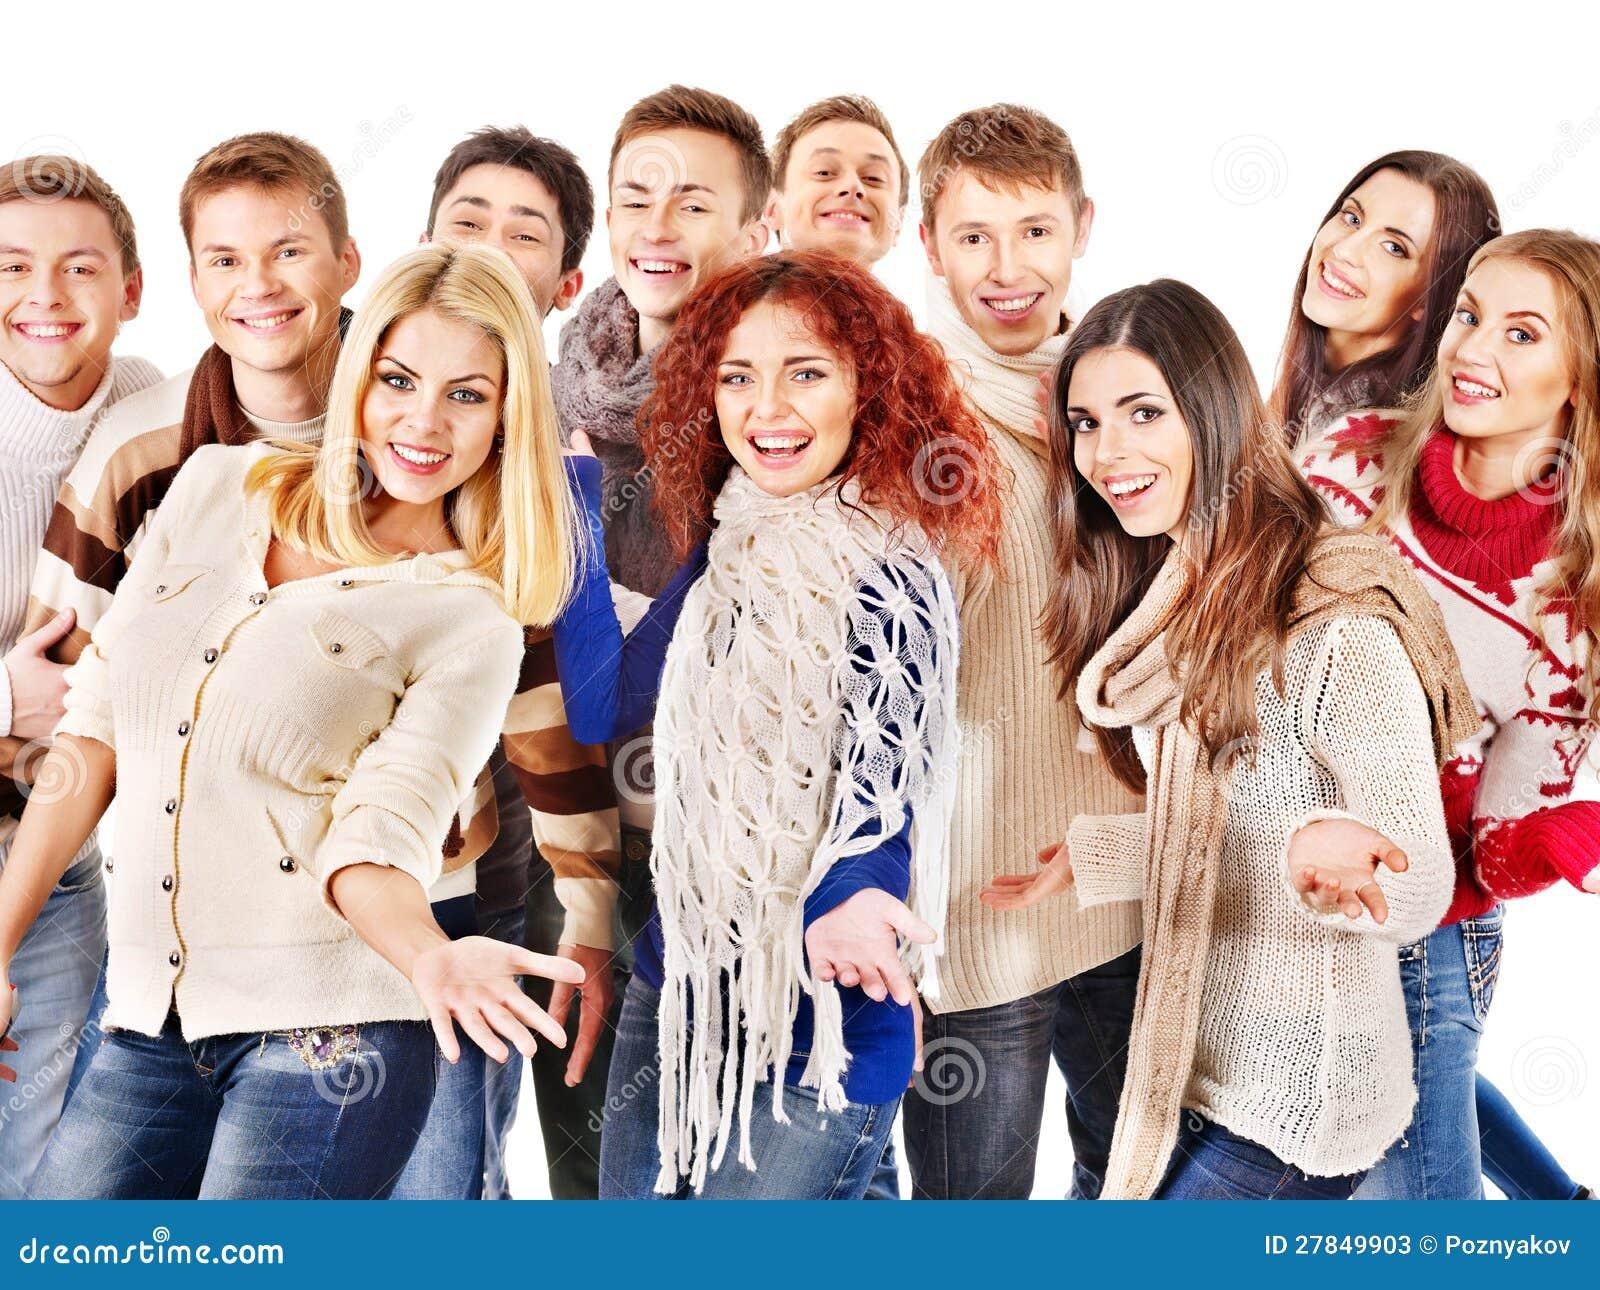 Group Clothing 106